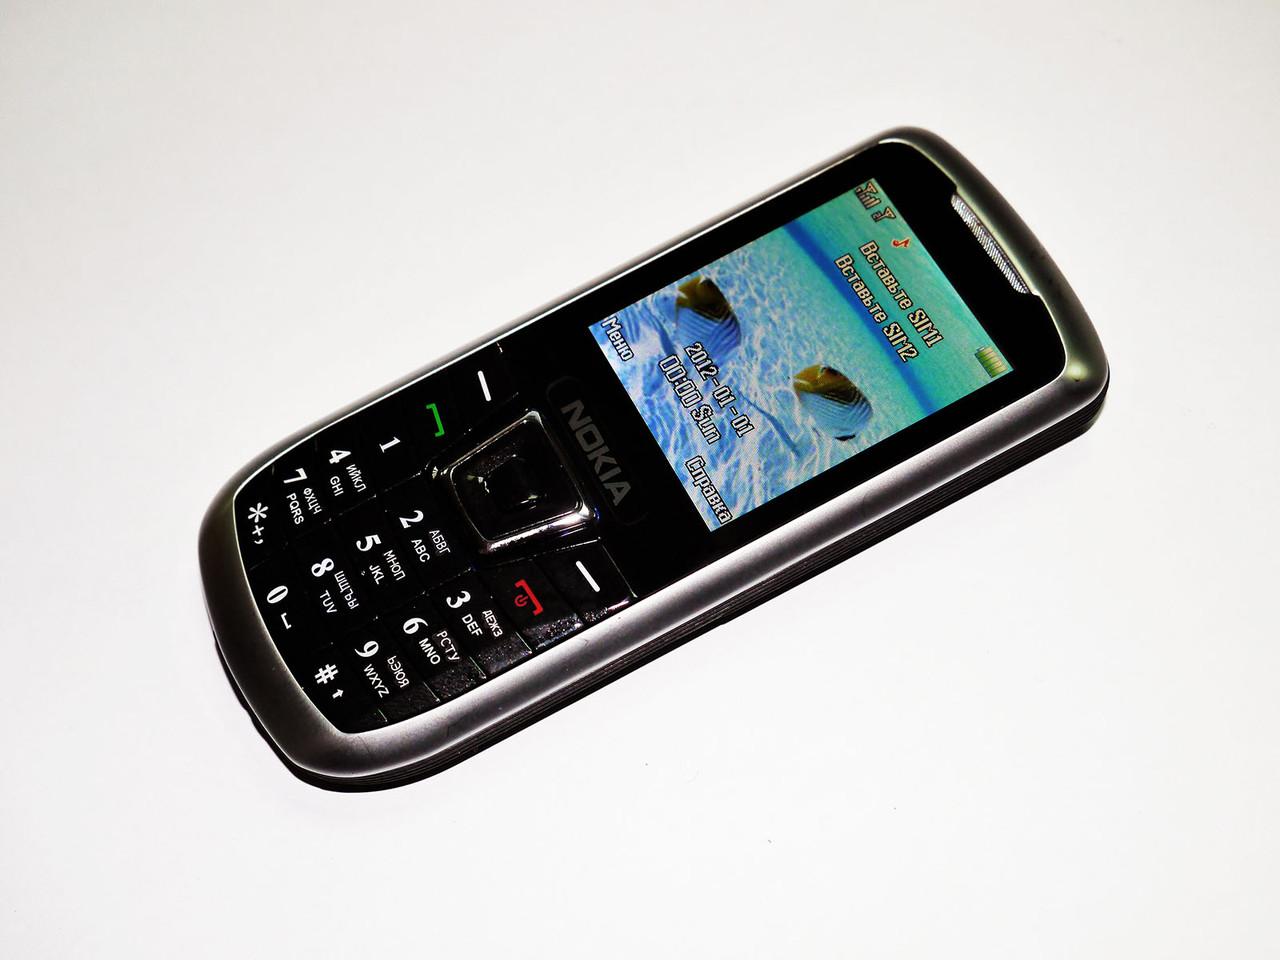 Телефон Nokia S3212 - 2 sim - Fm - Bt - Cam